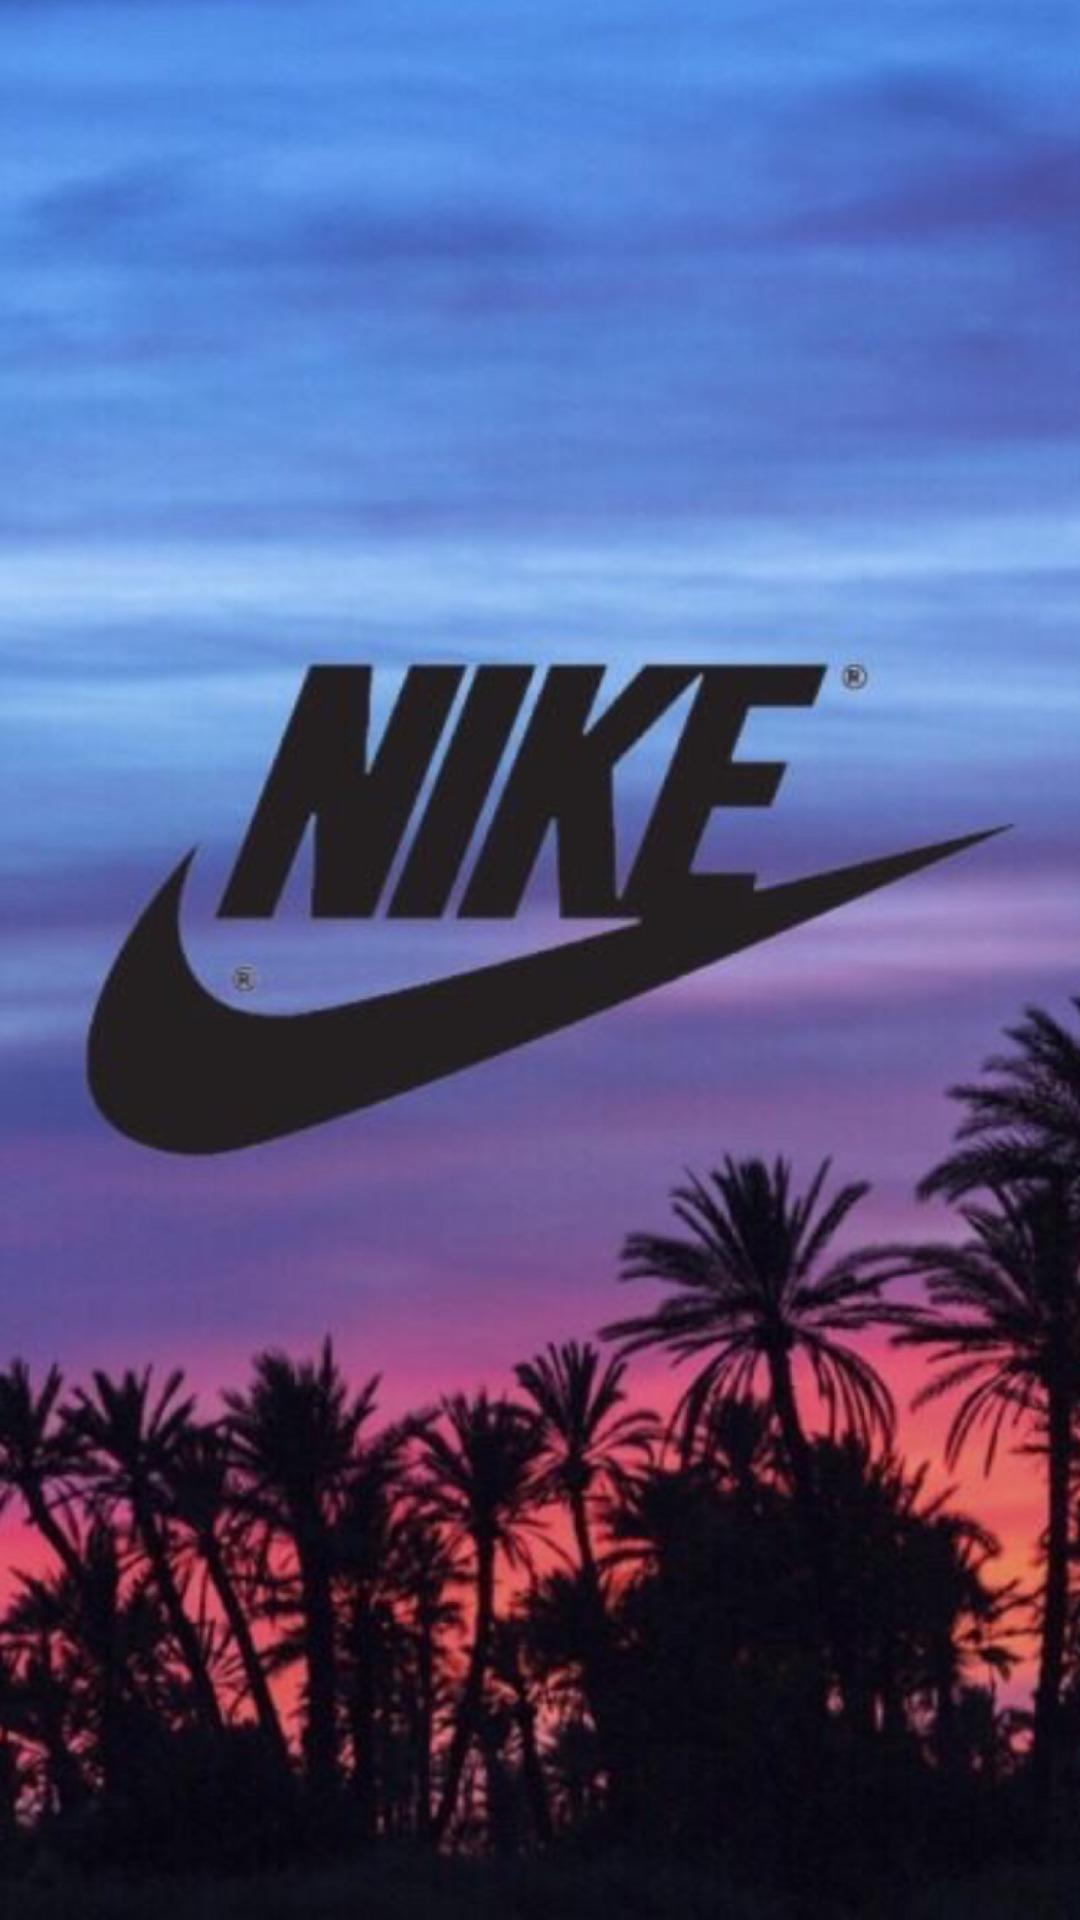 Swag Girl Wallpaper Iphone Hd Nike Backgrounds For Iphone Pixelstalk Net